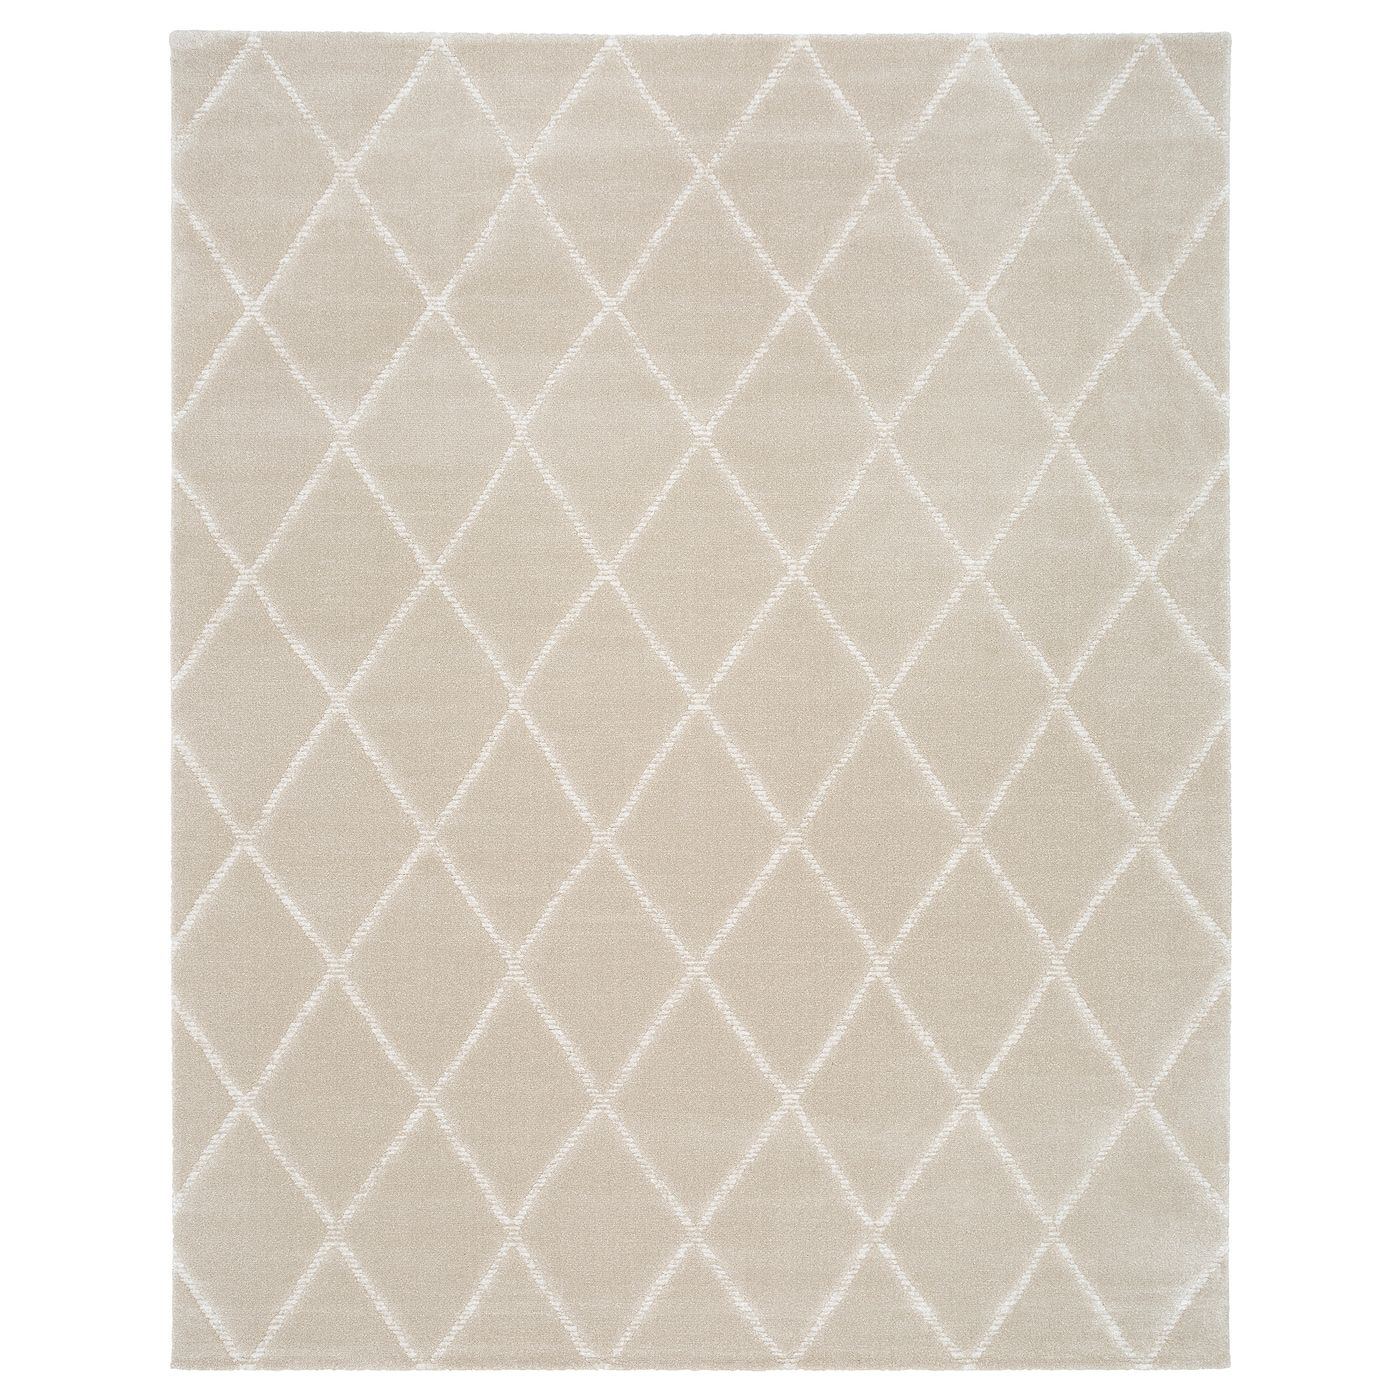 Vantore Rug Low Pile Beige White Diamond Pattern 7 10 X9